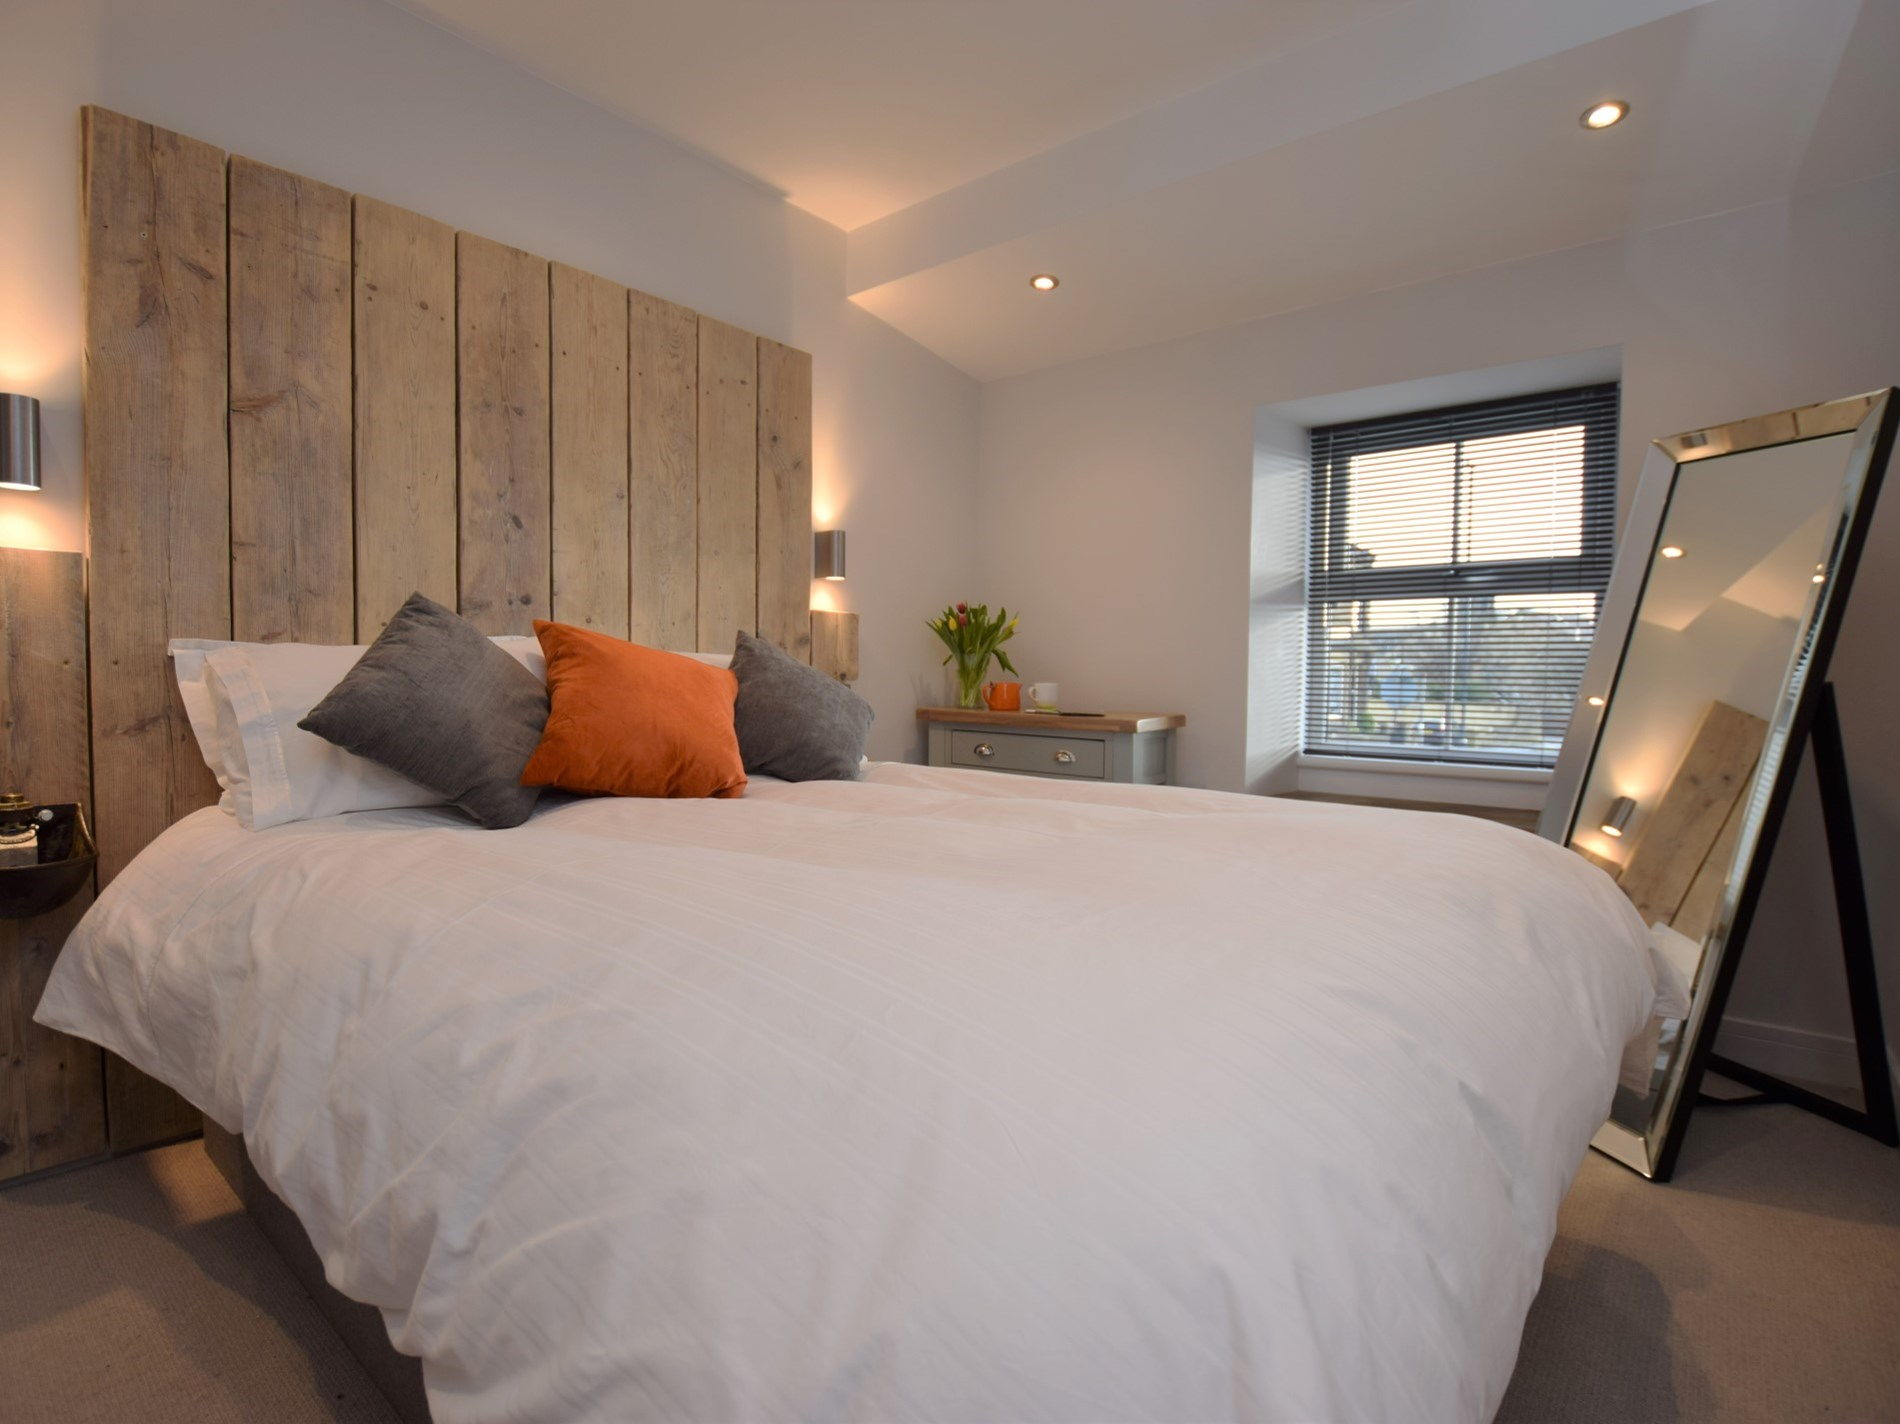 1 Bedroom Cottage in Skipton, Yorkshire Dales